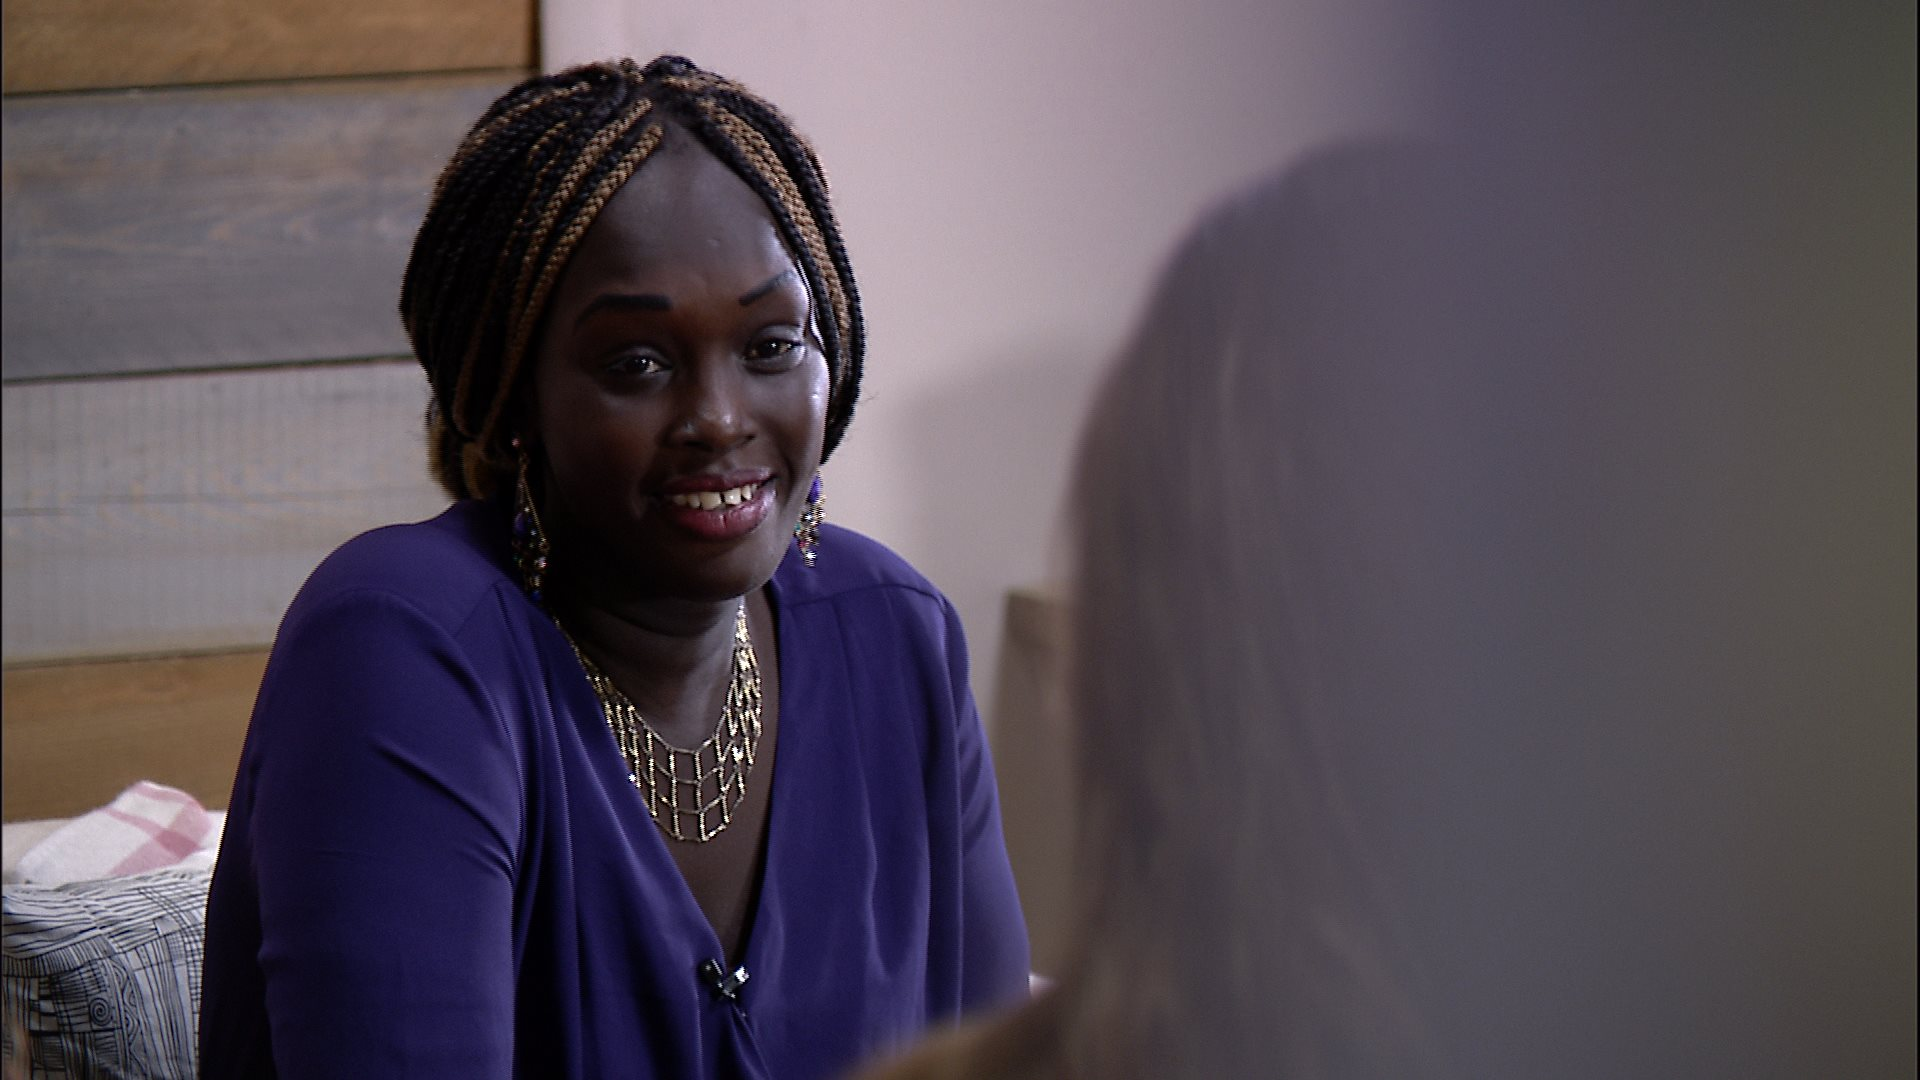 Natalie-Sudanese-guest